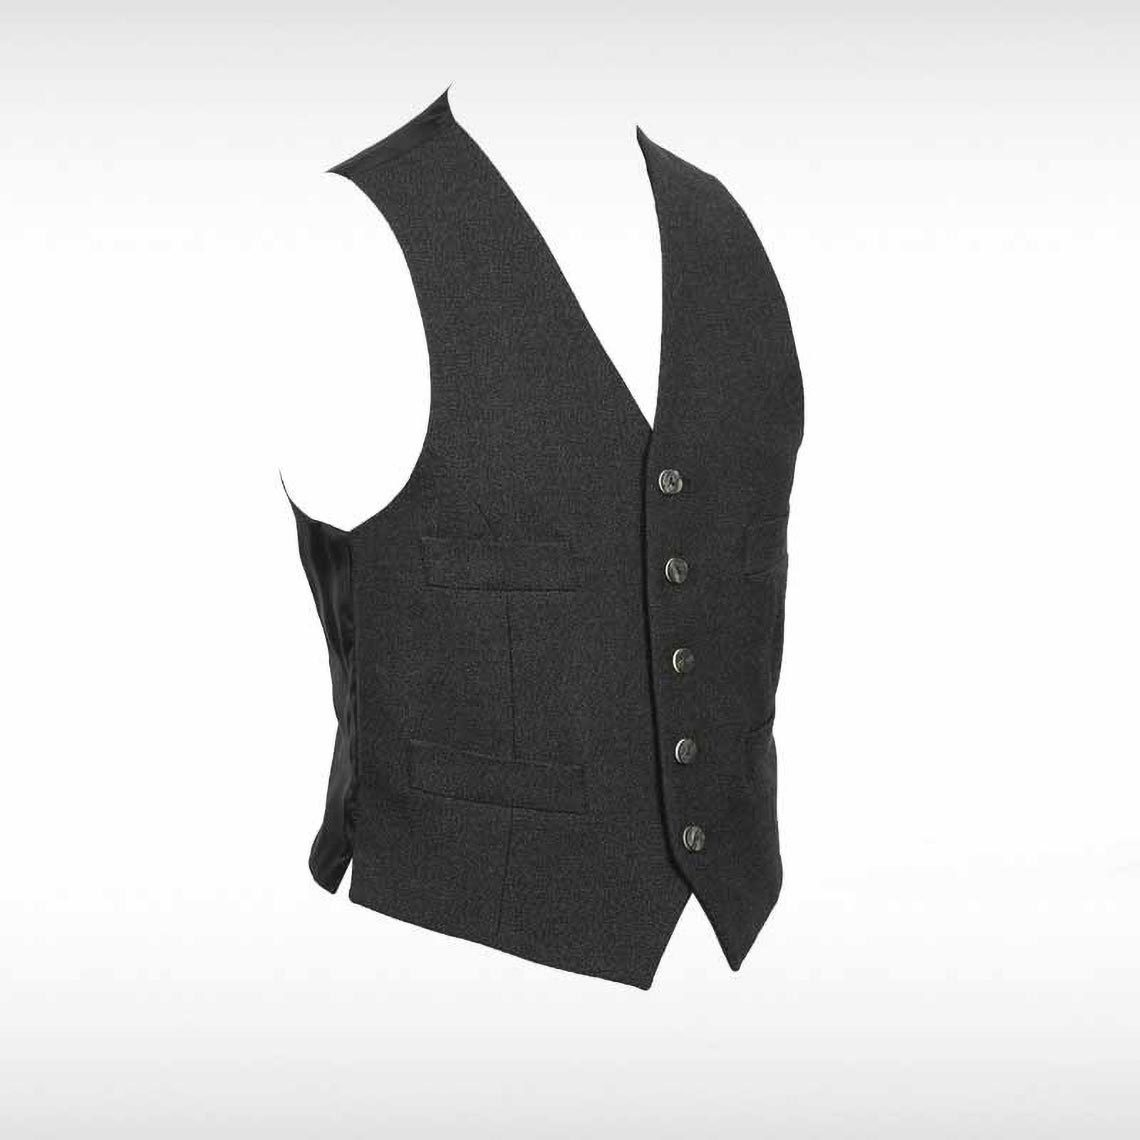 Charcoal Crail Jacket & Waistcoat